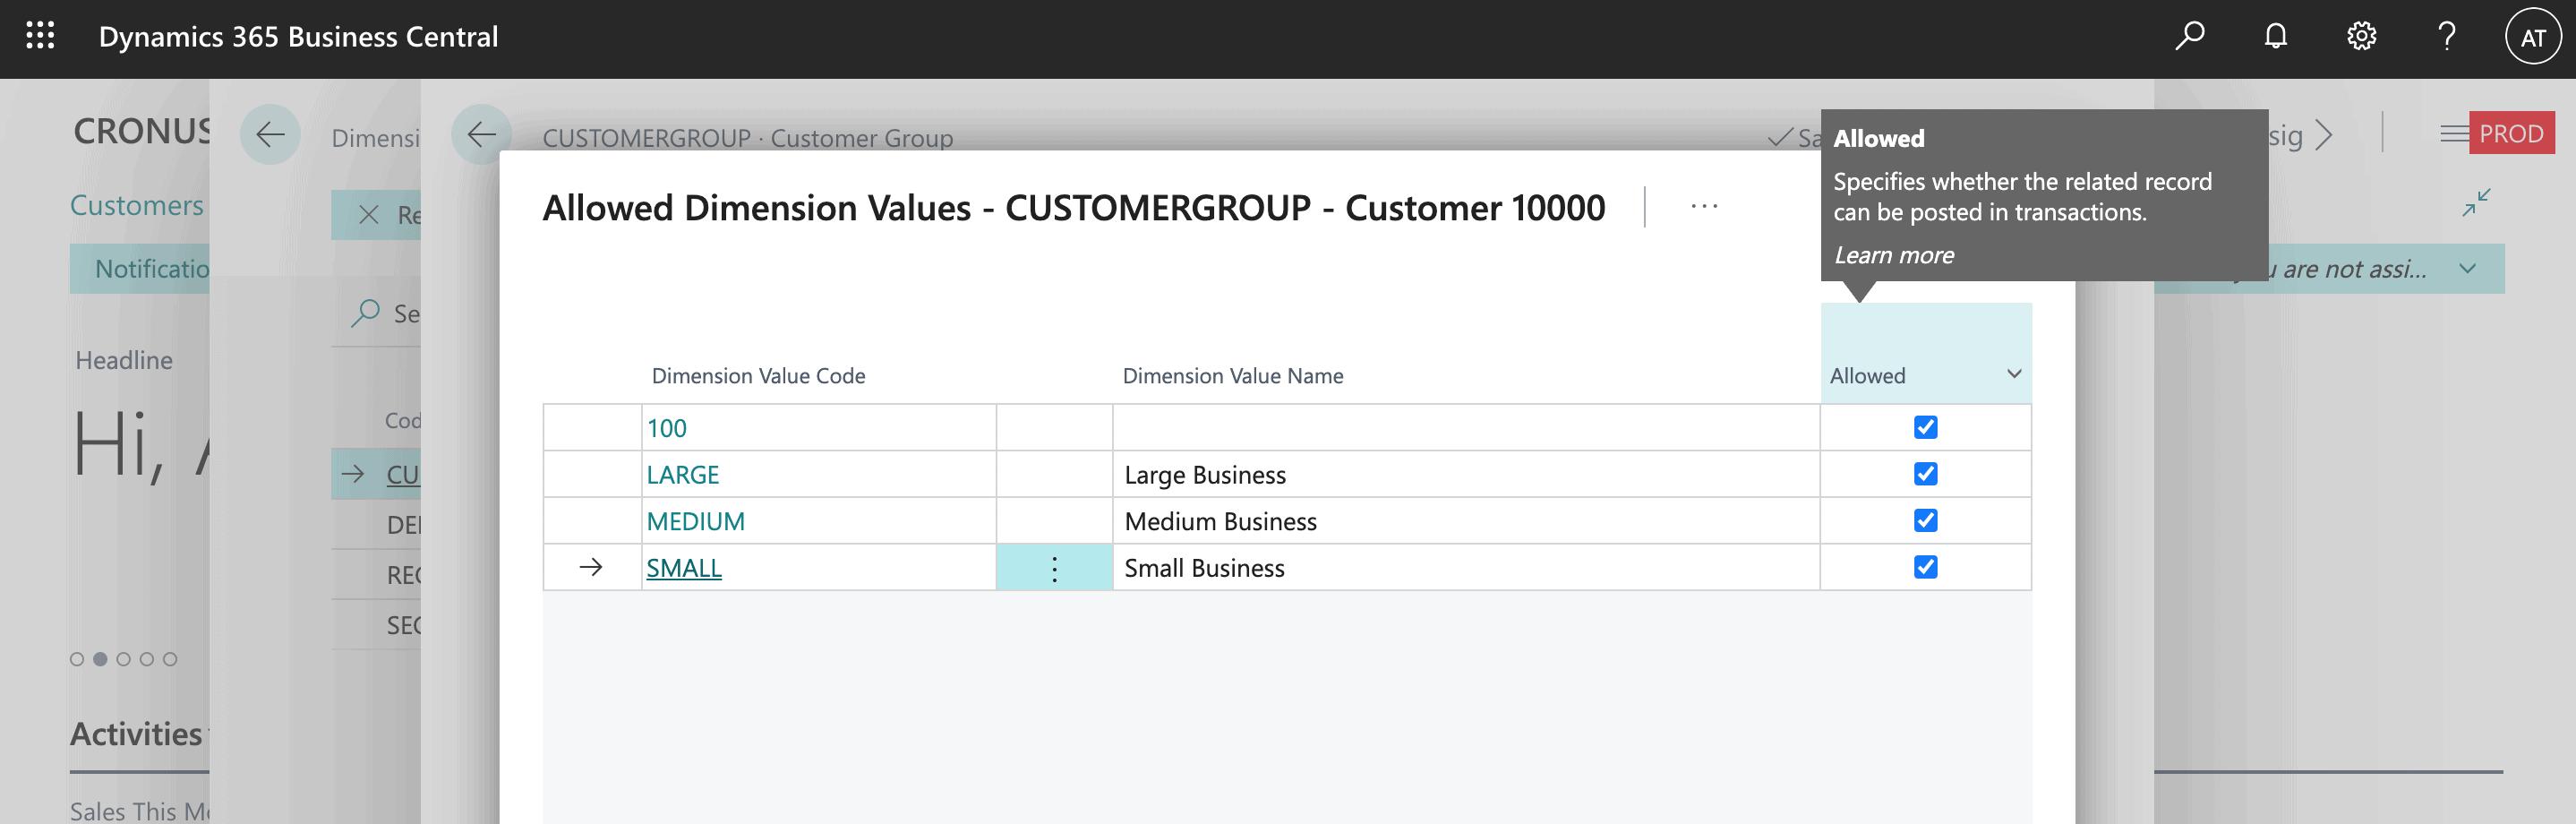 Microsoft Dynamics 365 Business Central Screenshot - Dimensions